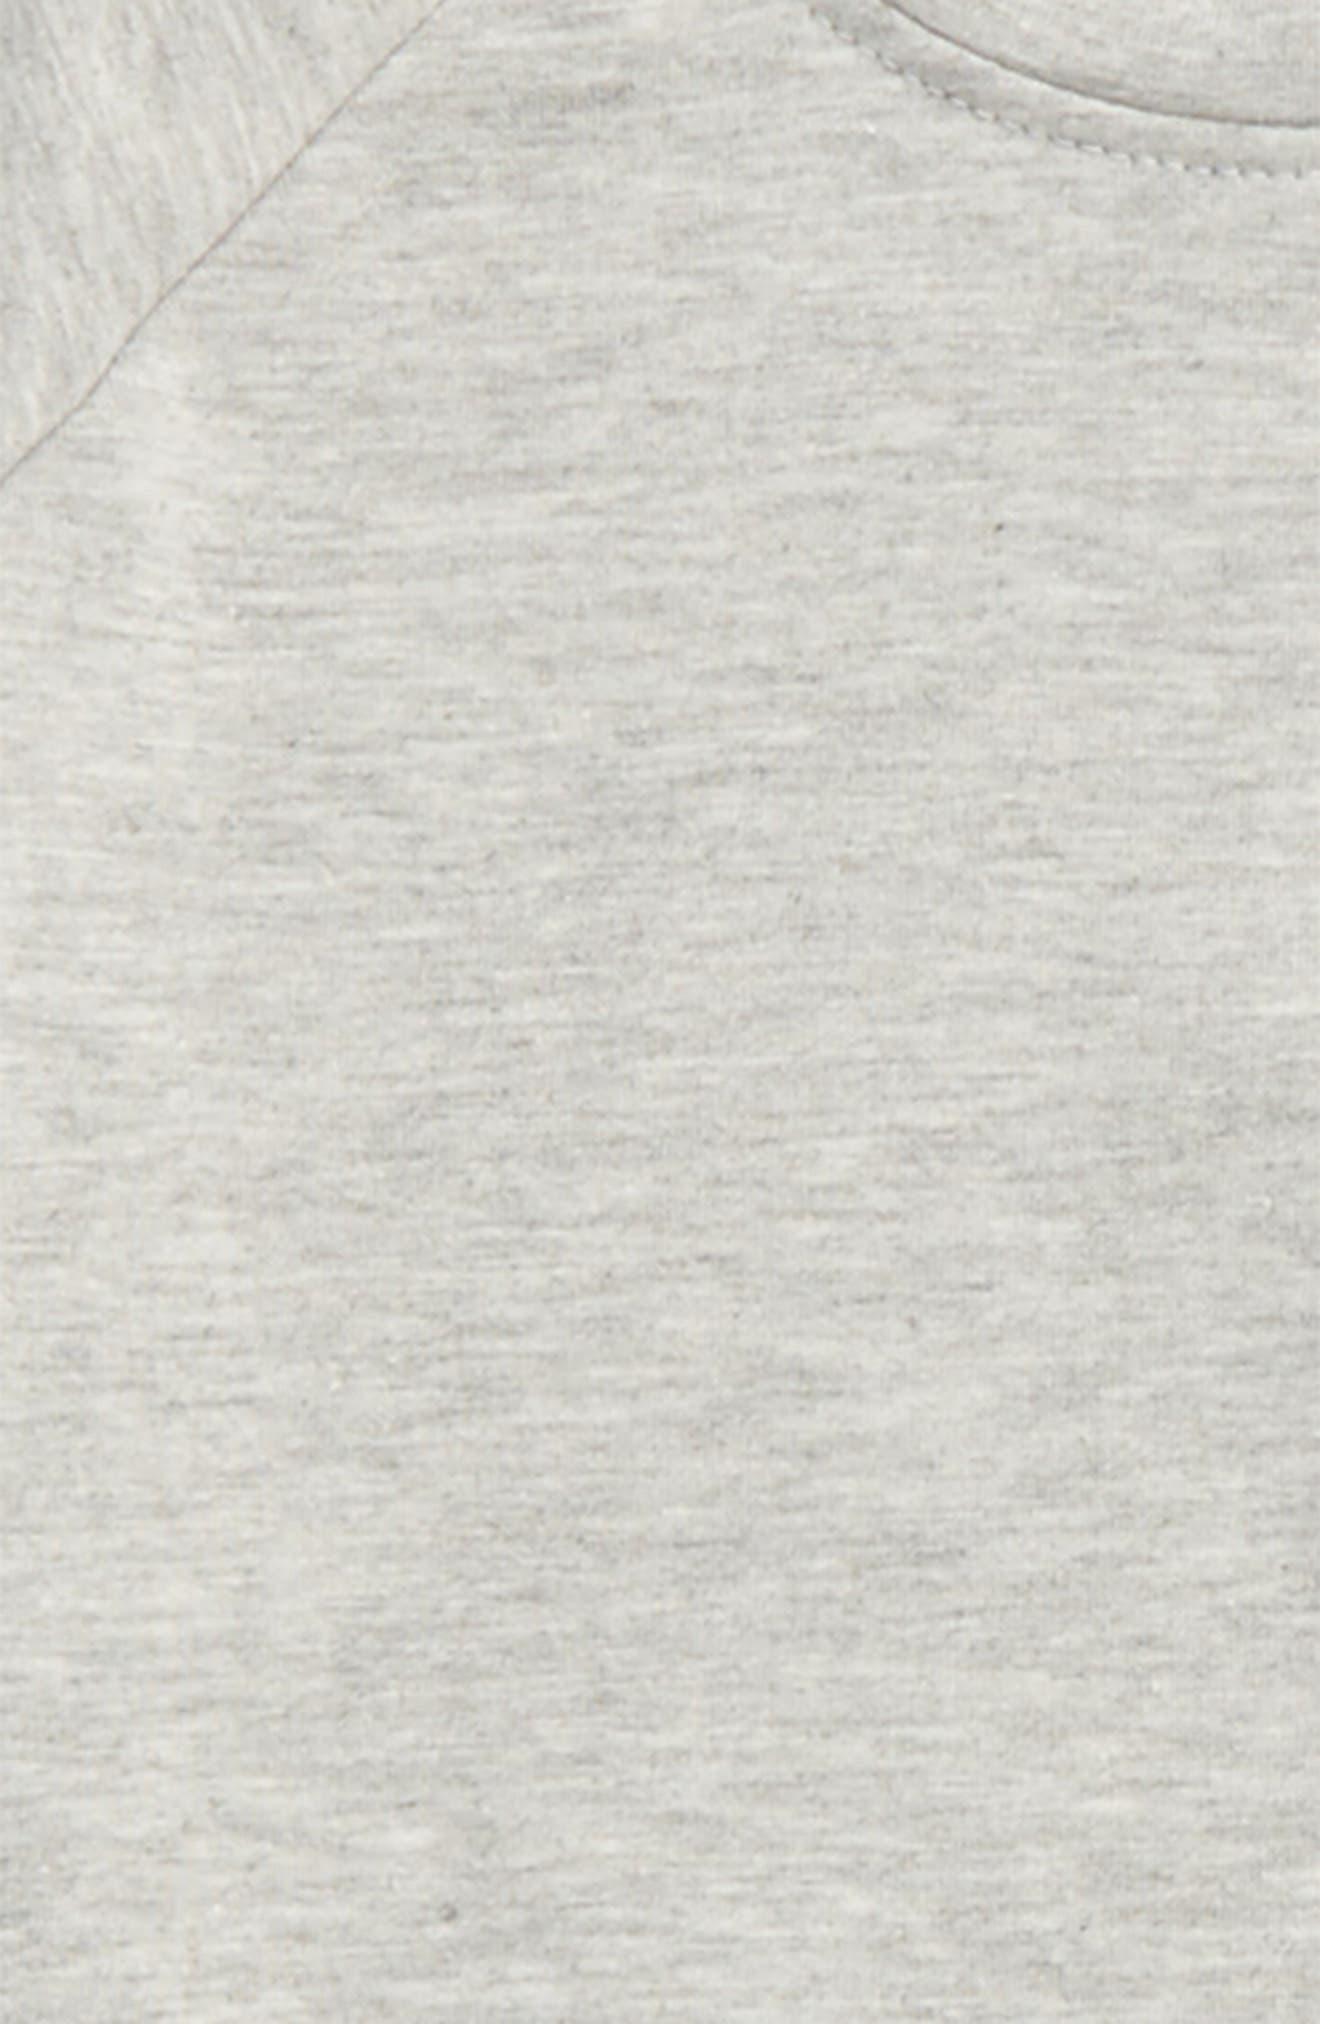 Cold Shoulder Sweatshirt,                             Alternate thumbnail 2, color,                             020